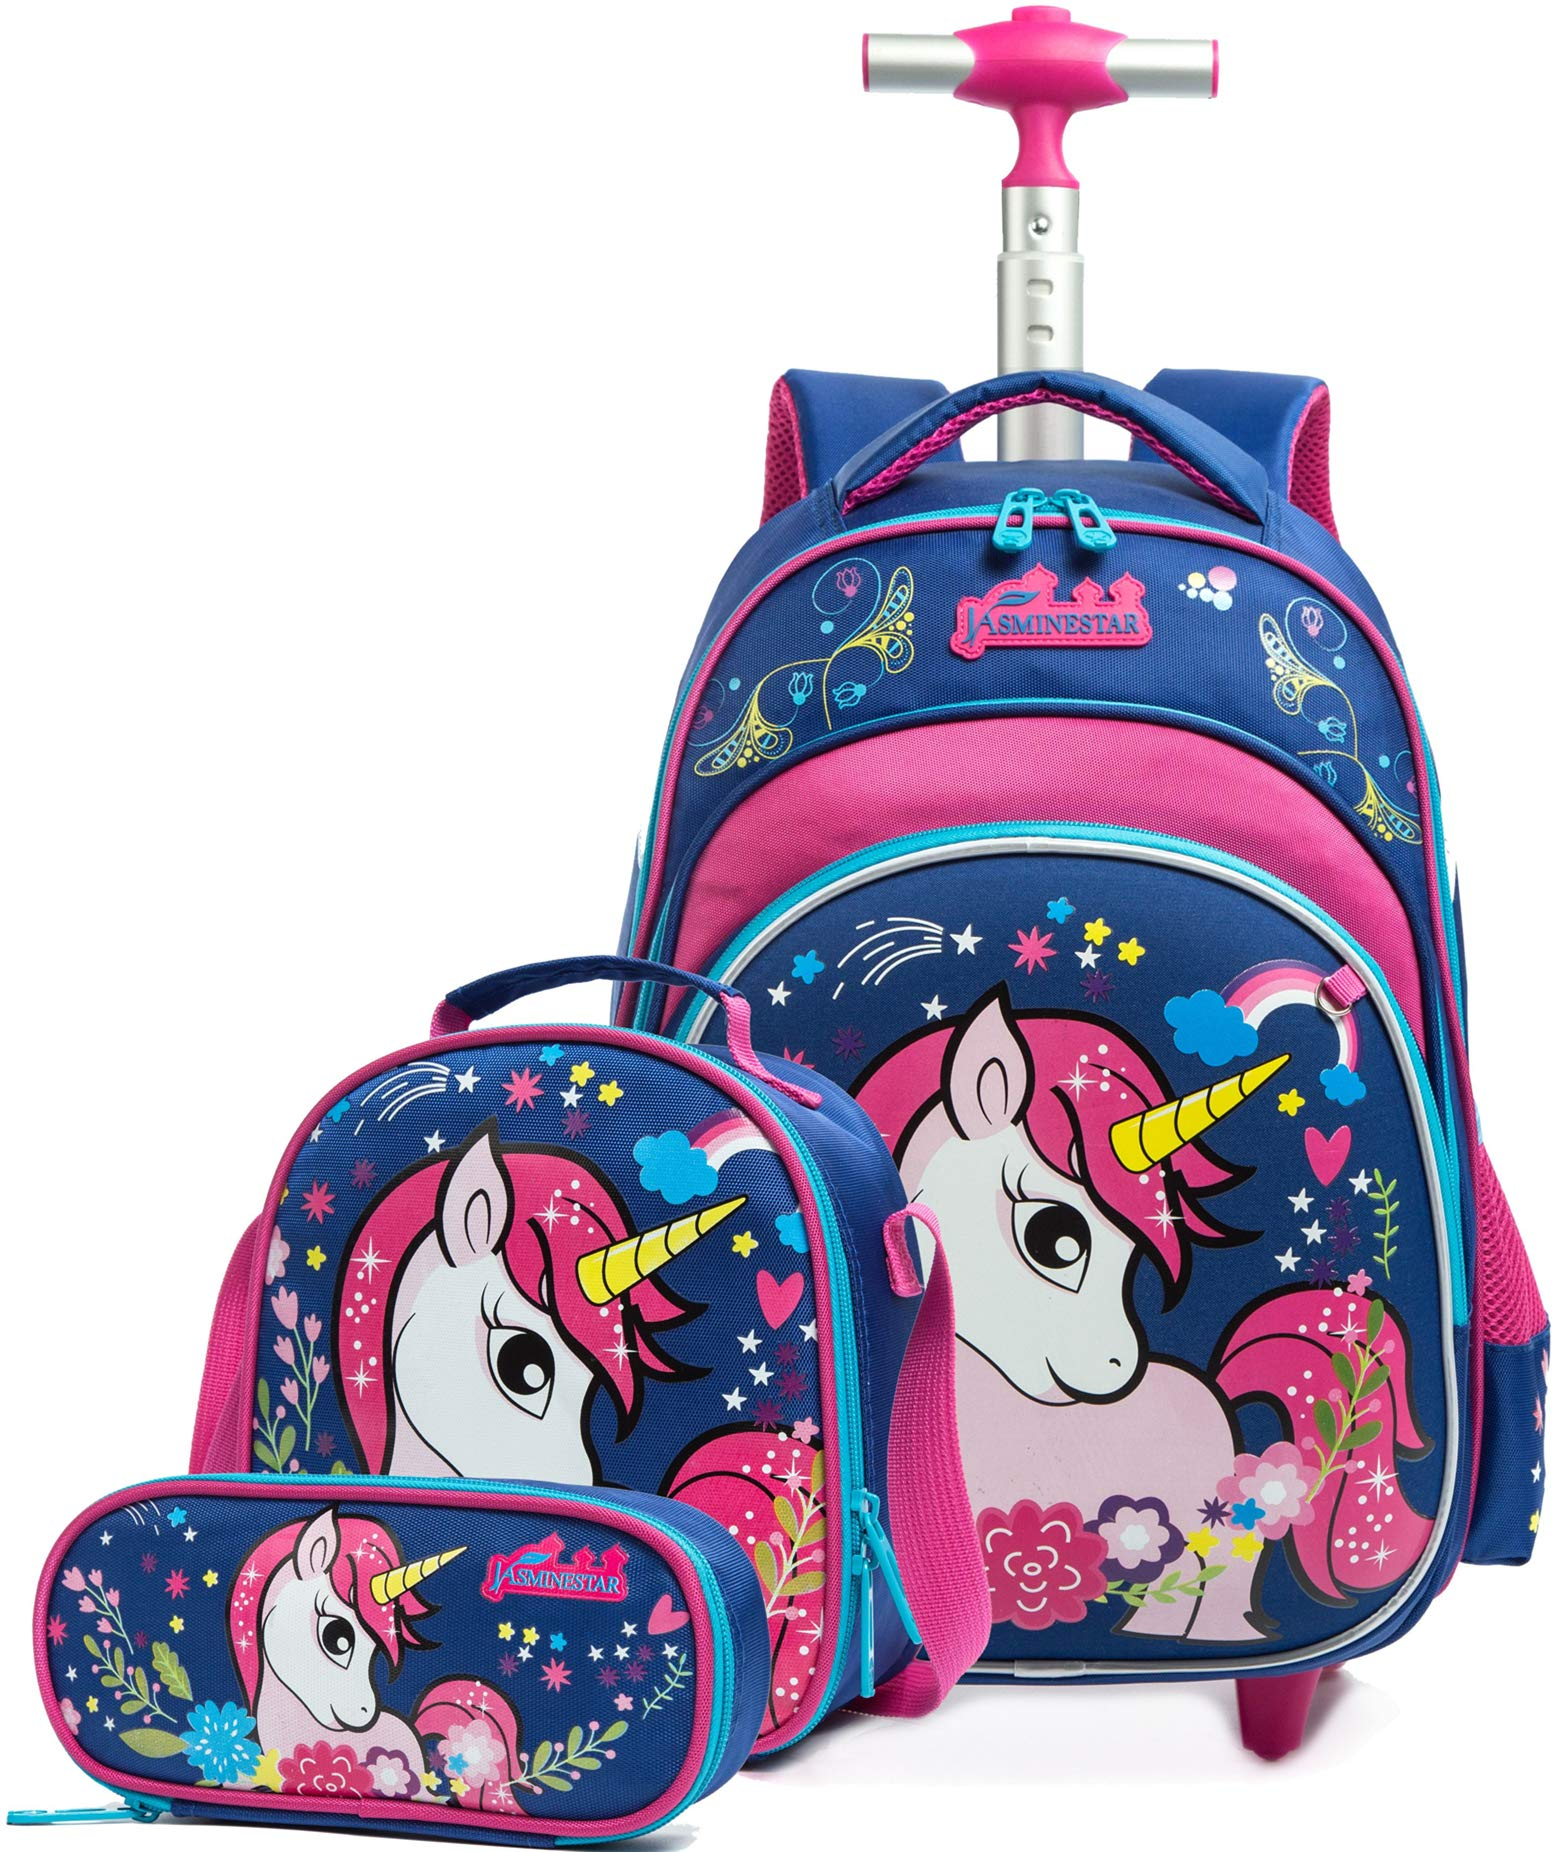 Meetbelify Unicorn Rolling Backpacks Backpack